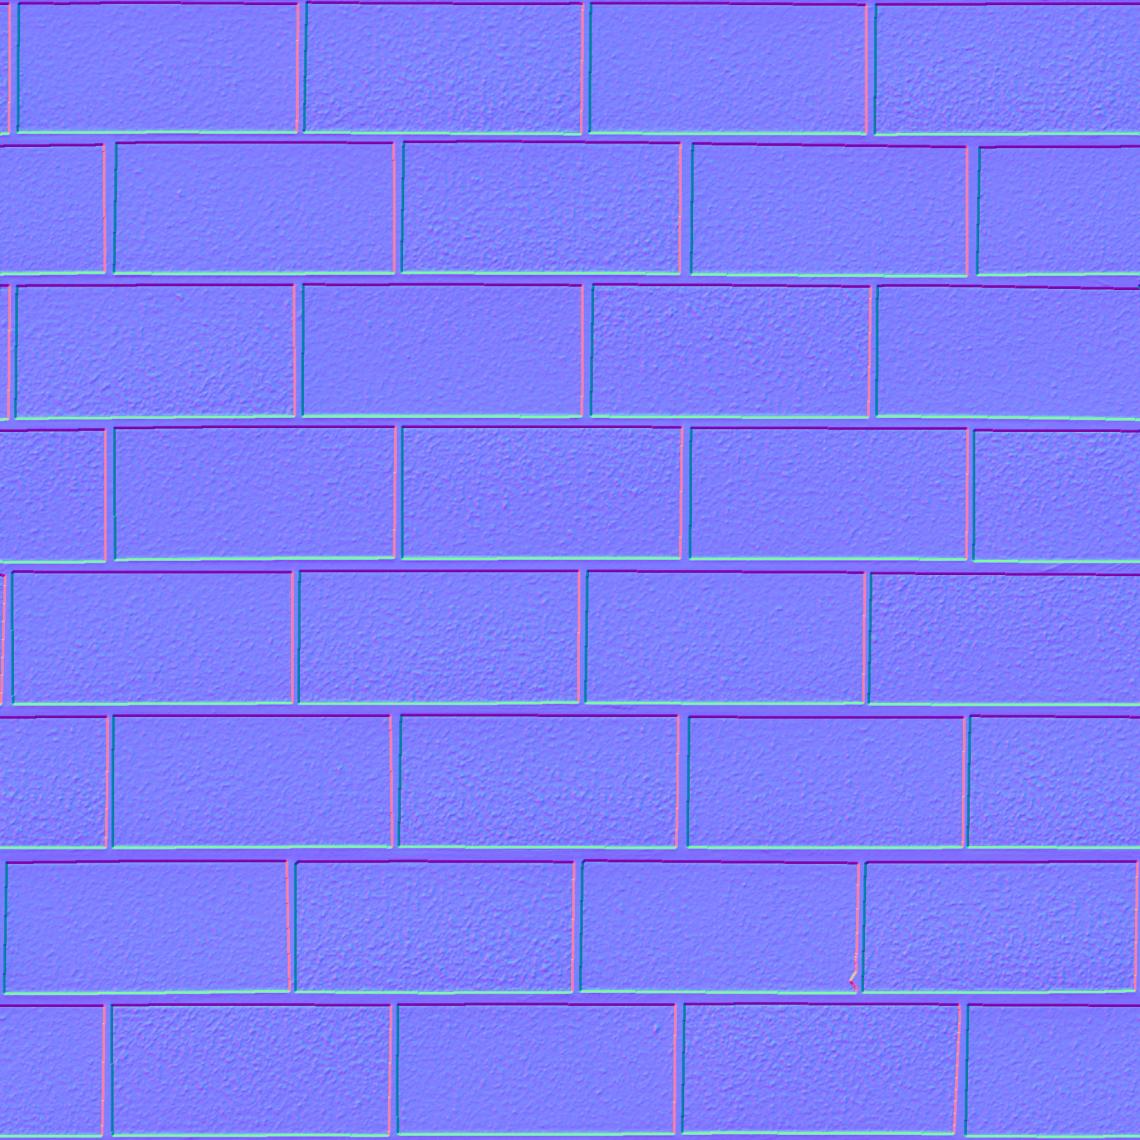 Simple-Tiles-06-Normal